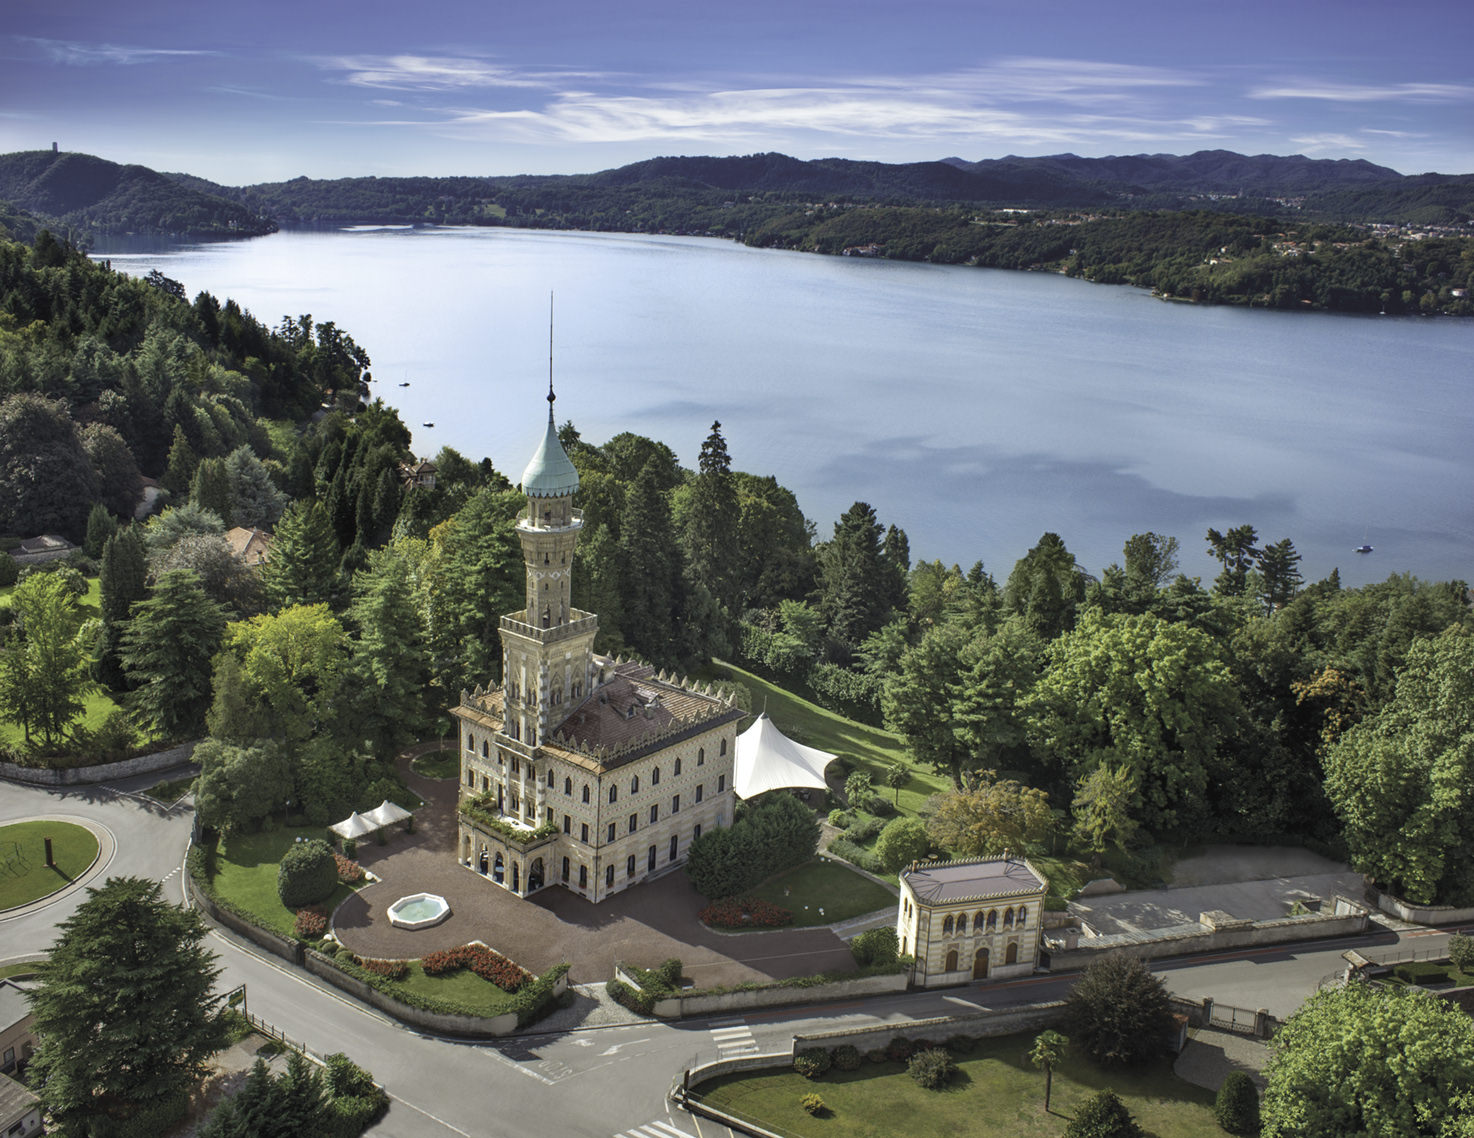 Aerial view of Villa Crespi on Lake Orta